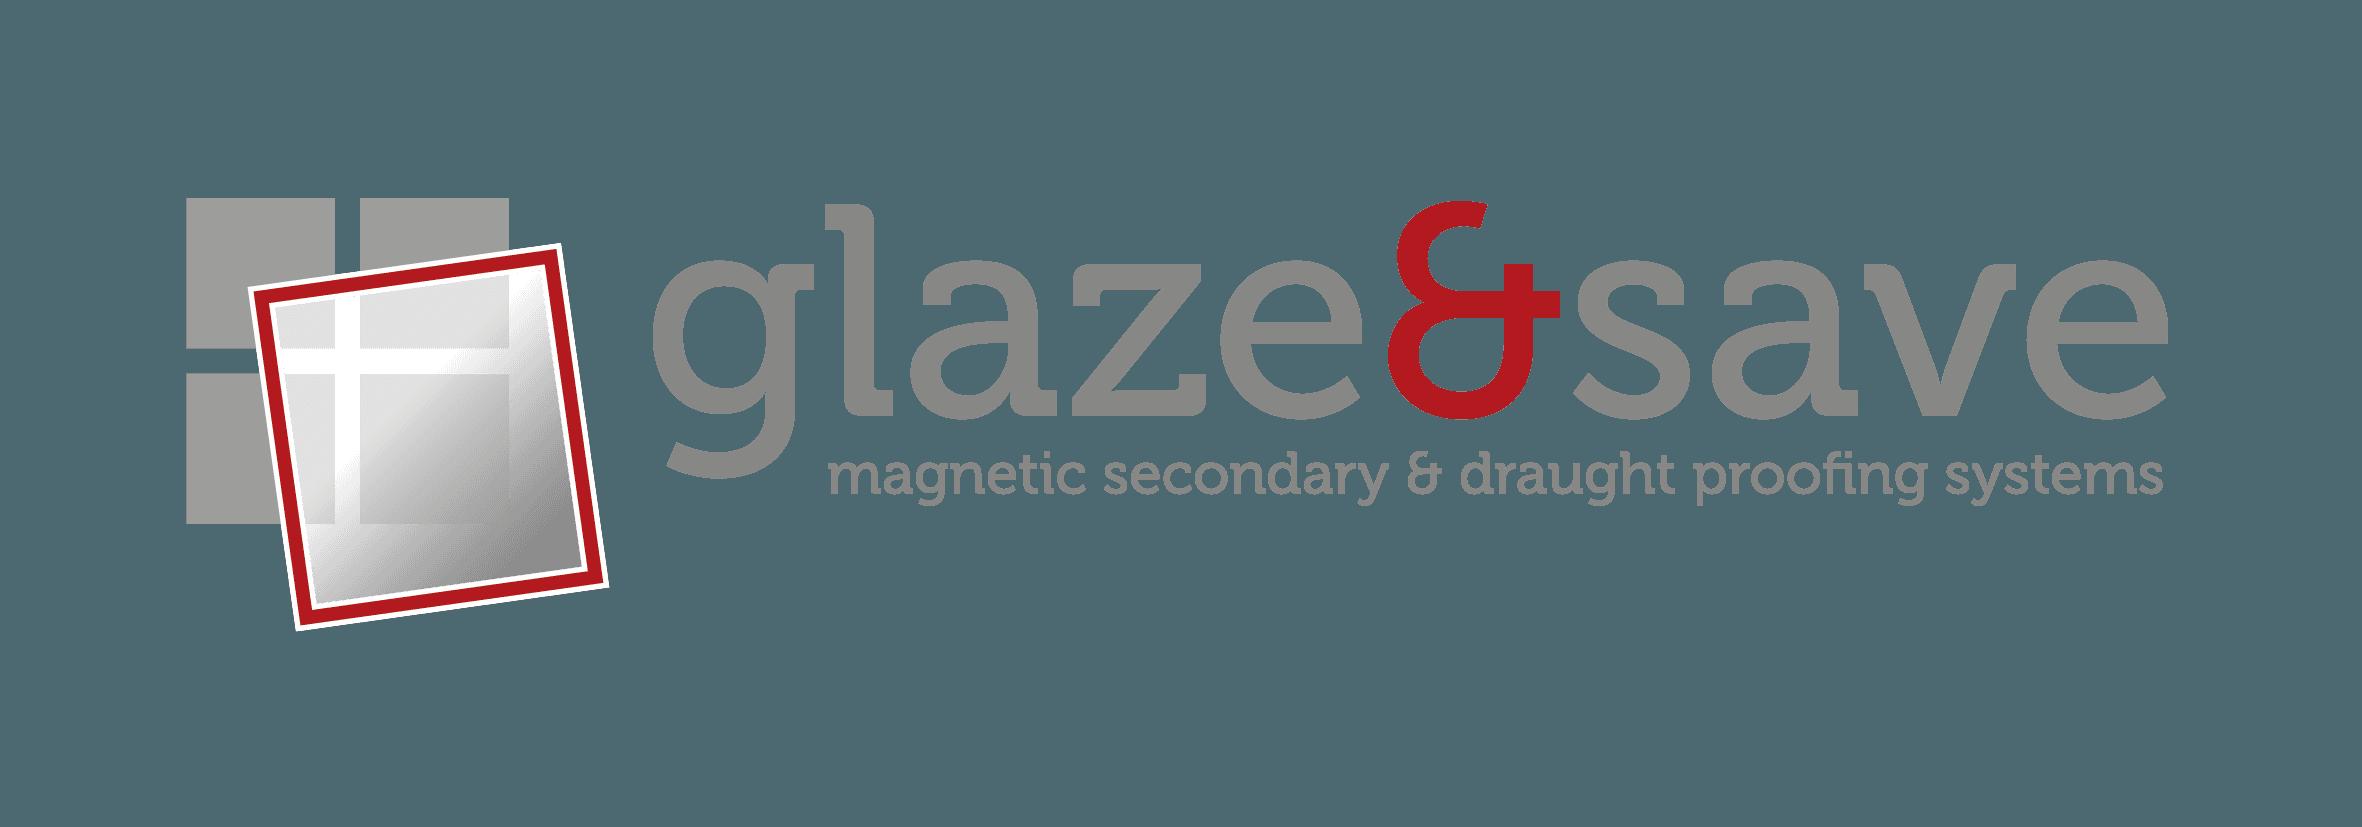 Glaze and save logo